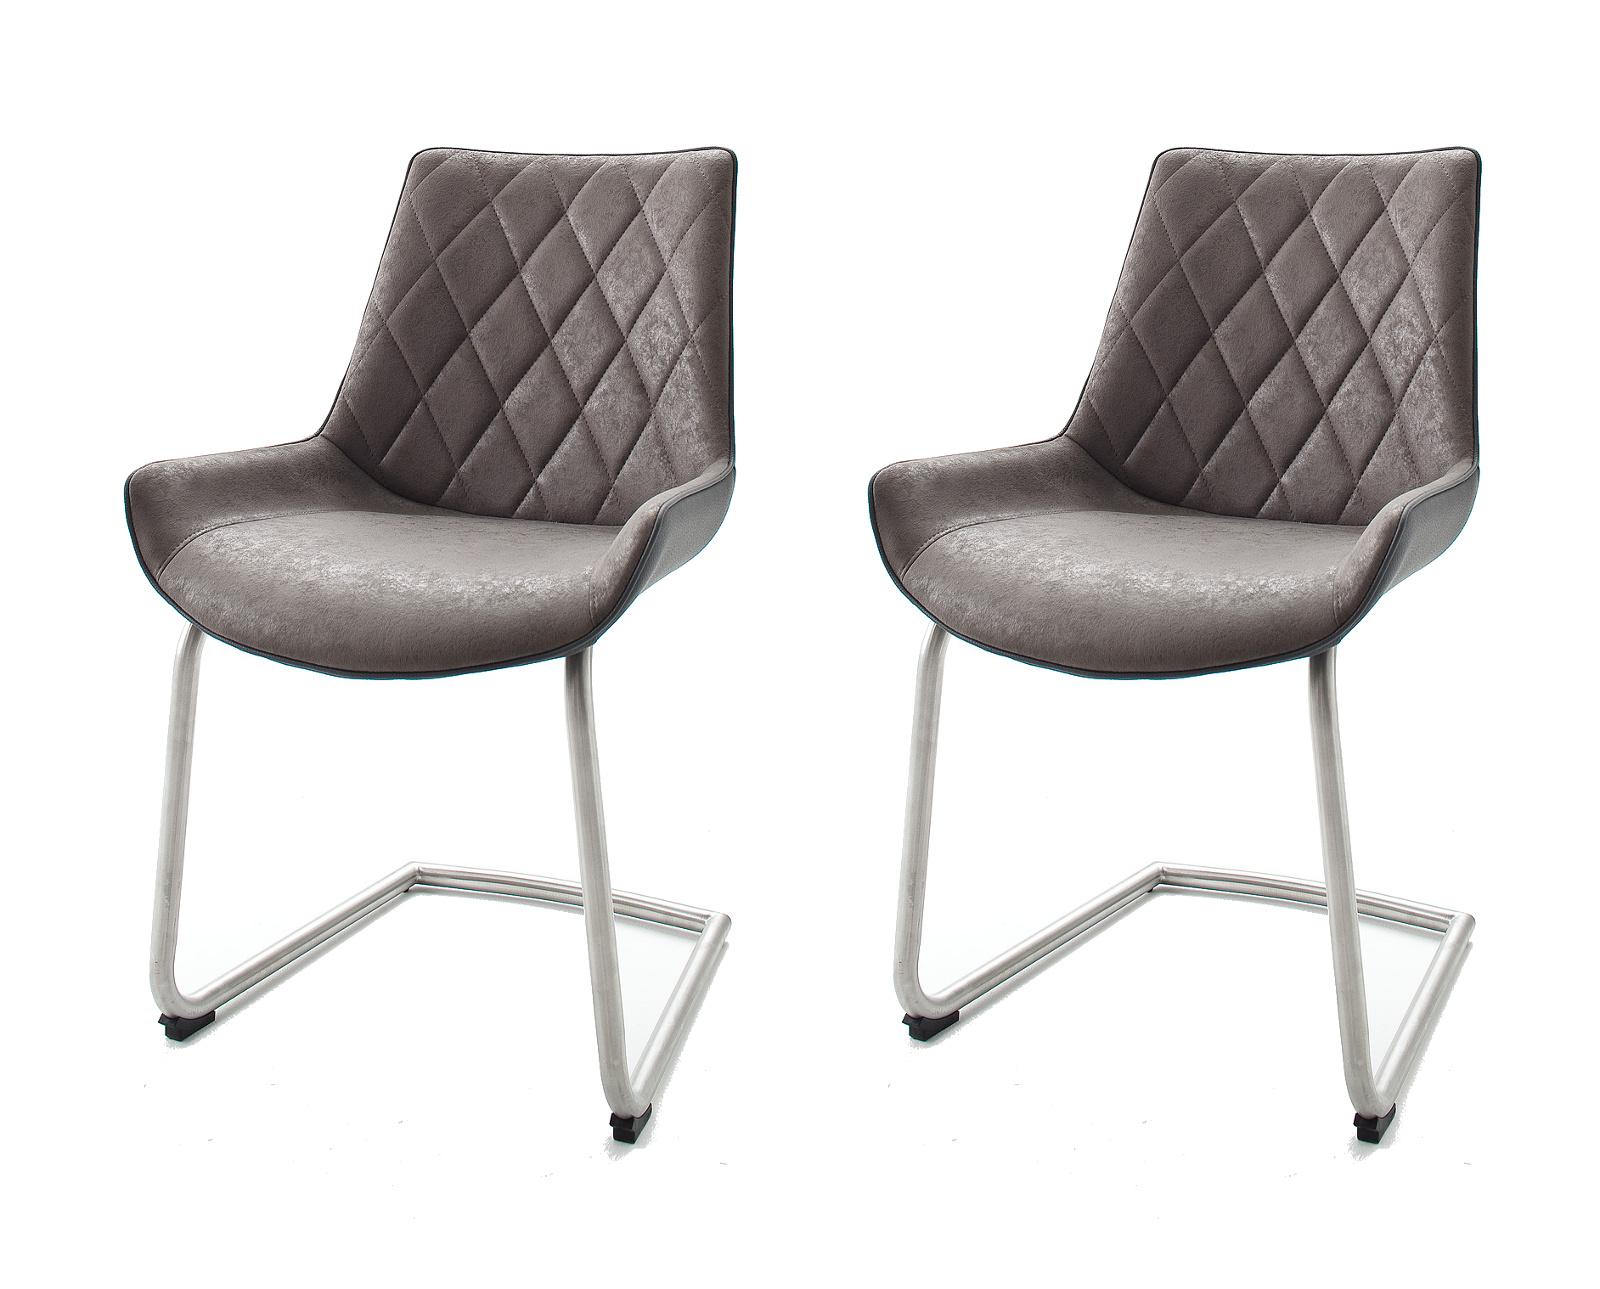 2 X Stuhl Danita Grau Schwinger